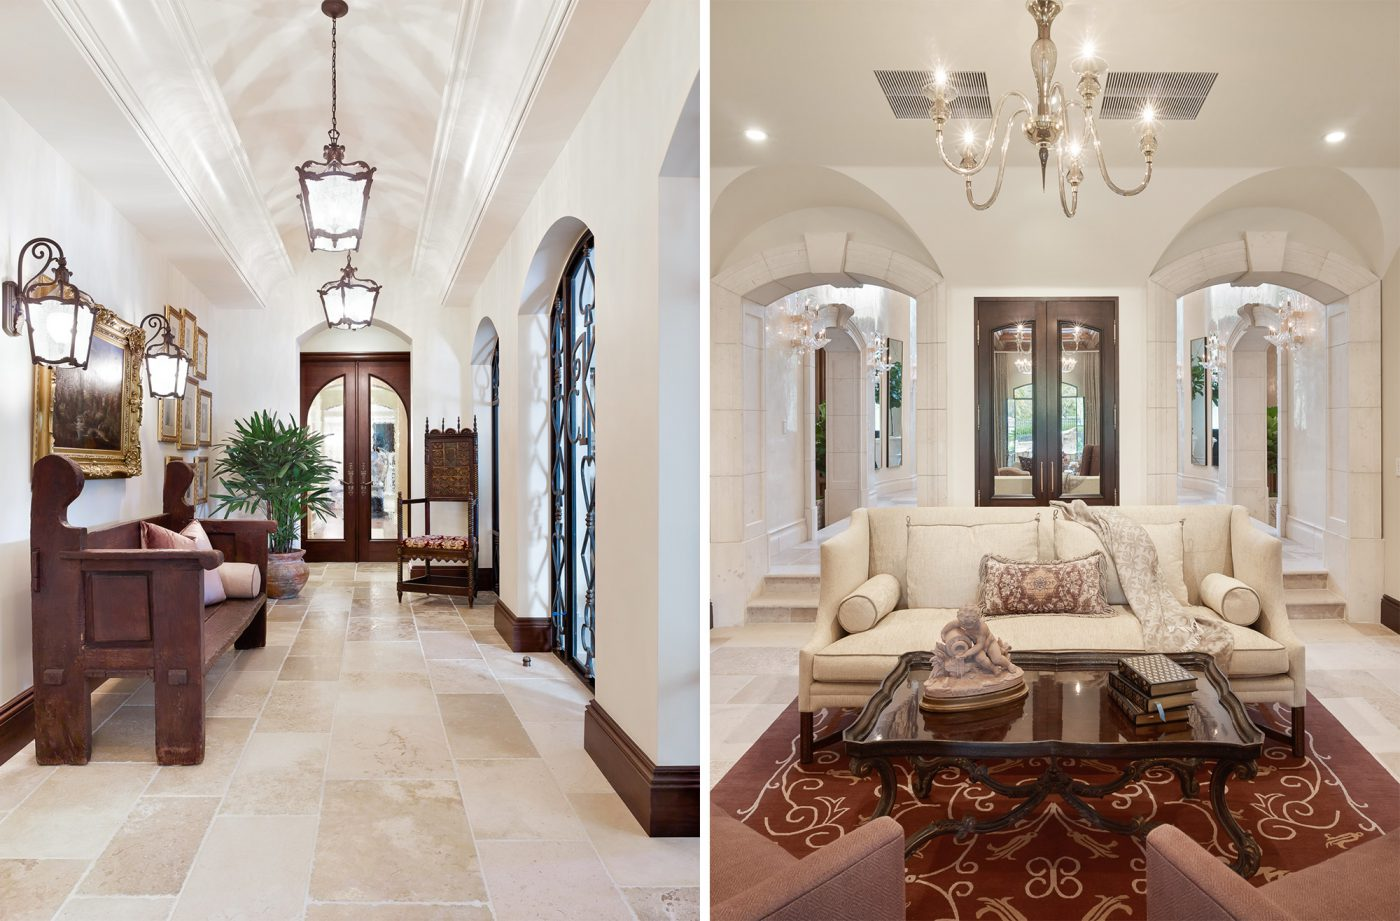 Renaissance revival great room tara dudley interiors for Tara louise interior decoration design